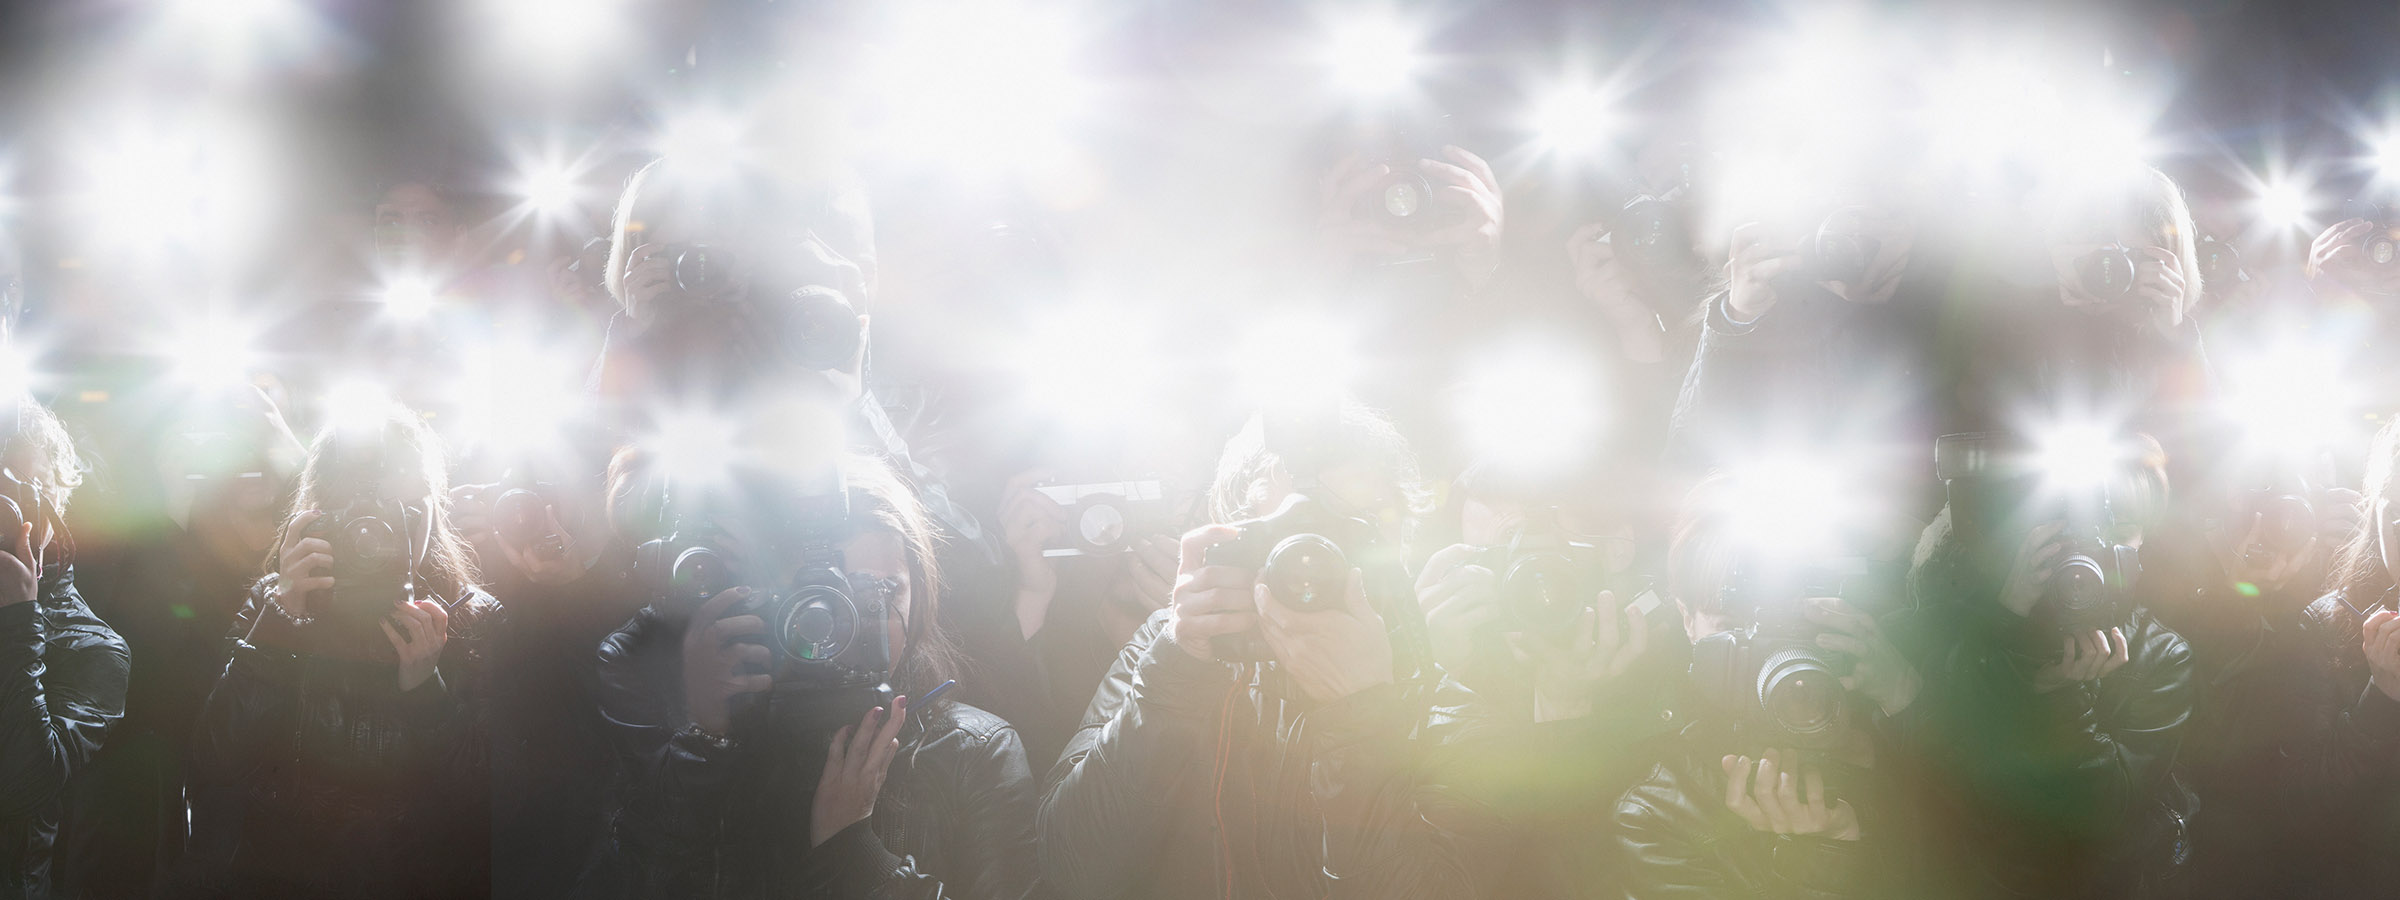 image of paparazzi cameras